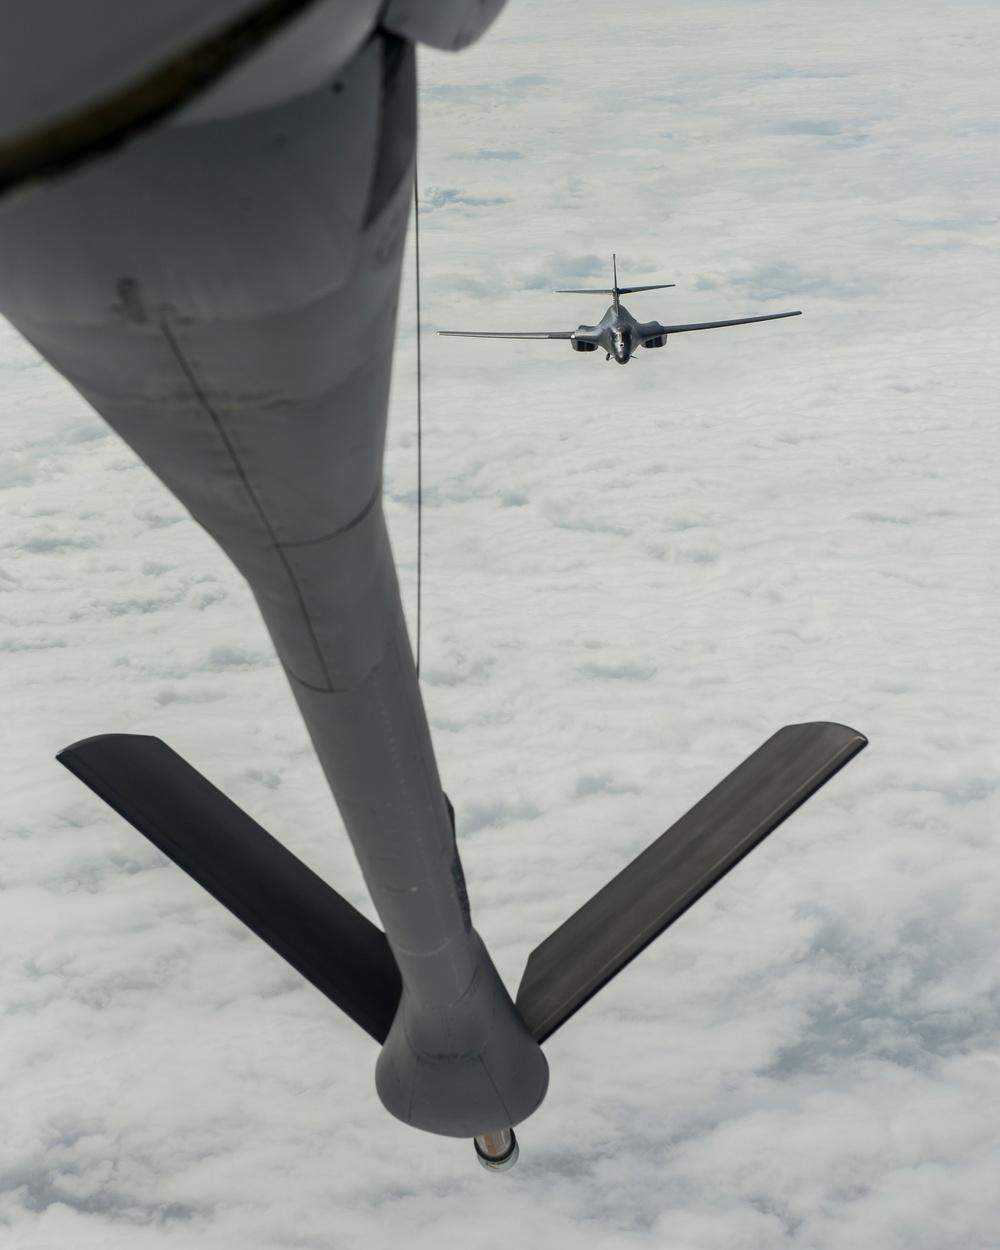 Patrolling the Pacific B-1B Lancer